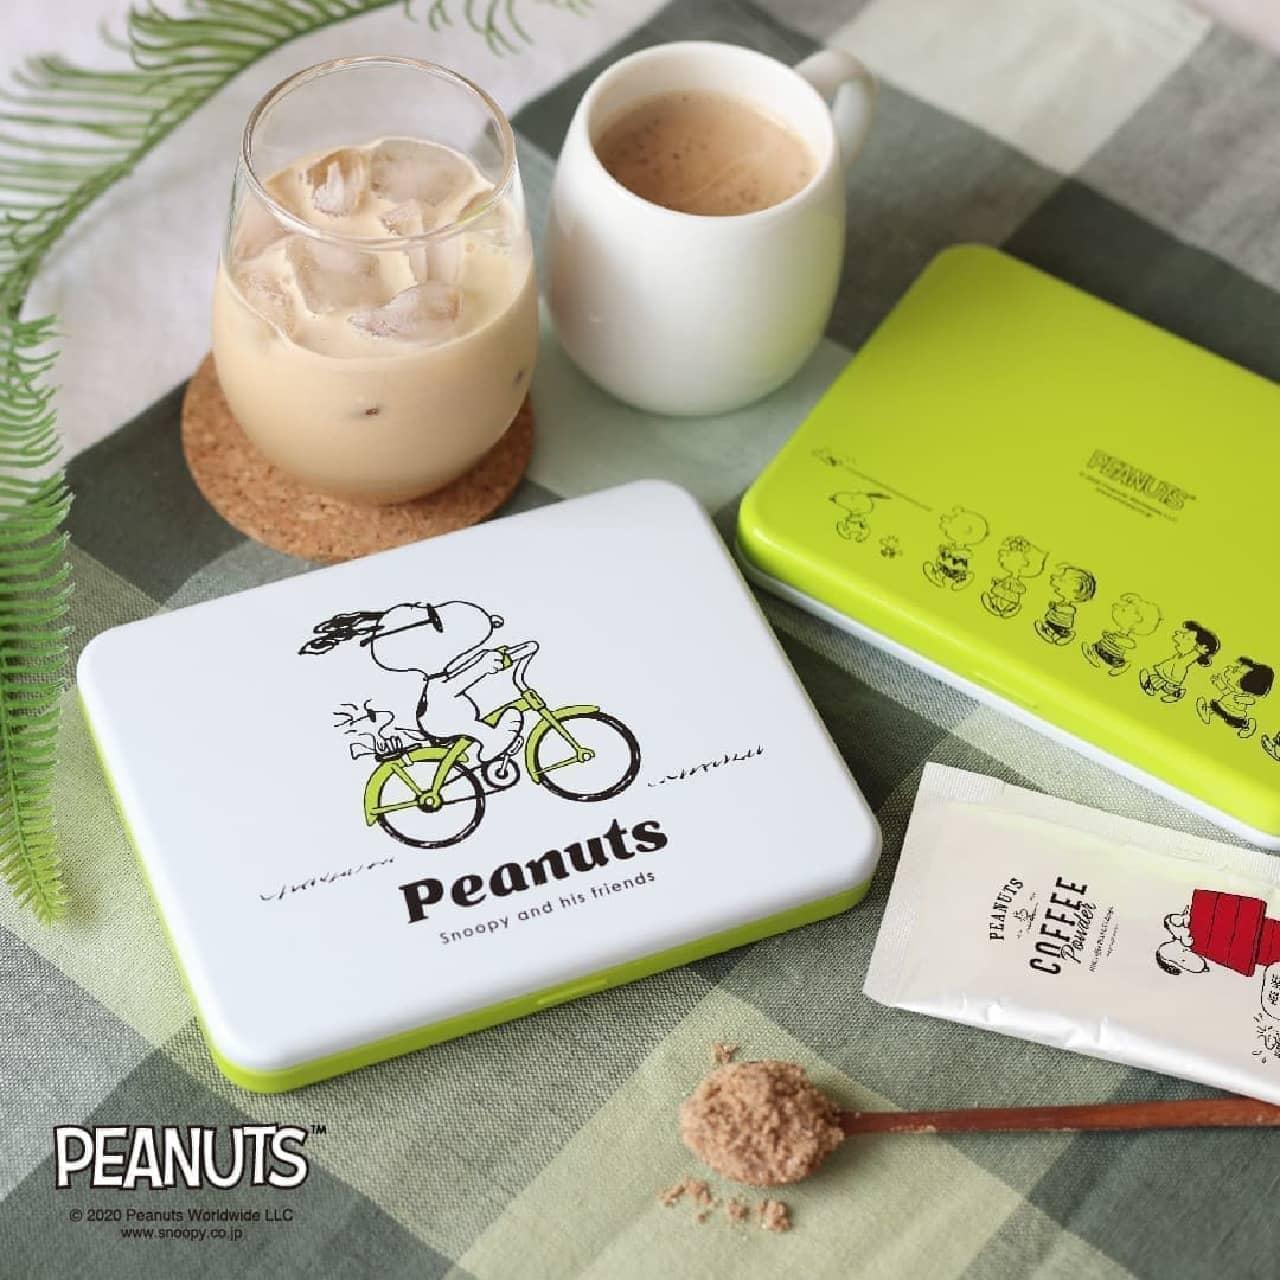 『PEANUTS coffee(ピーナッツコーヒー)』シリーズから、「ココナッツラテ」と「ハニーコーヒー」